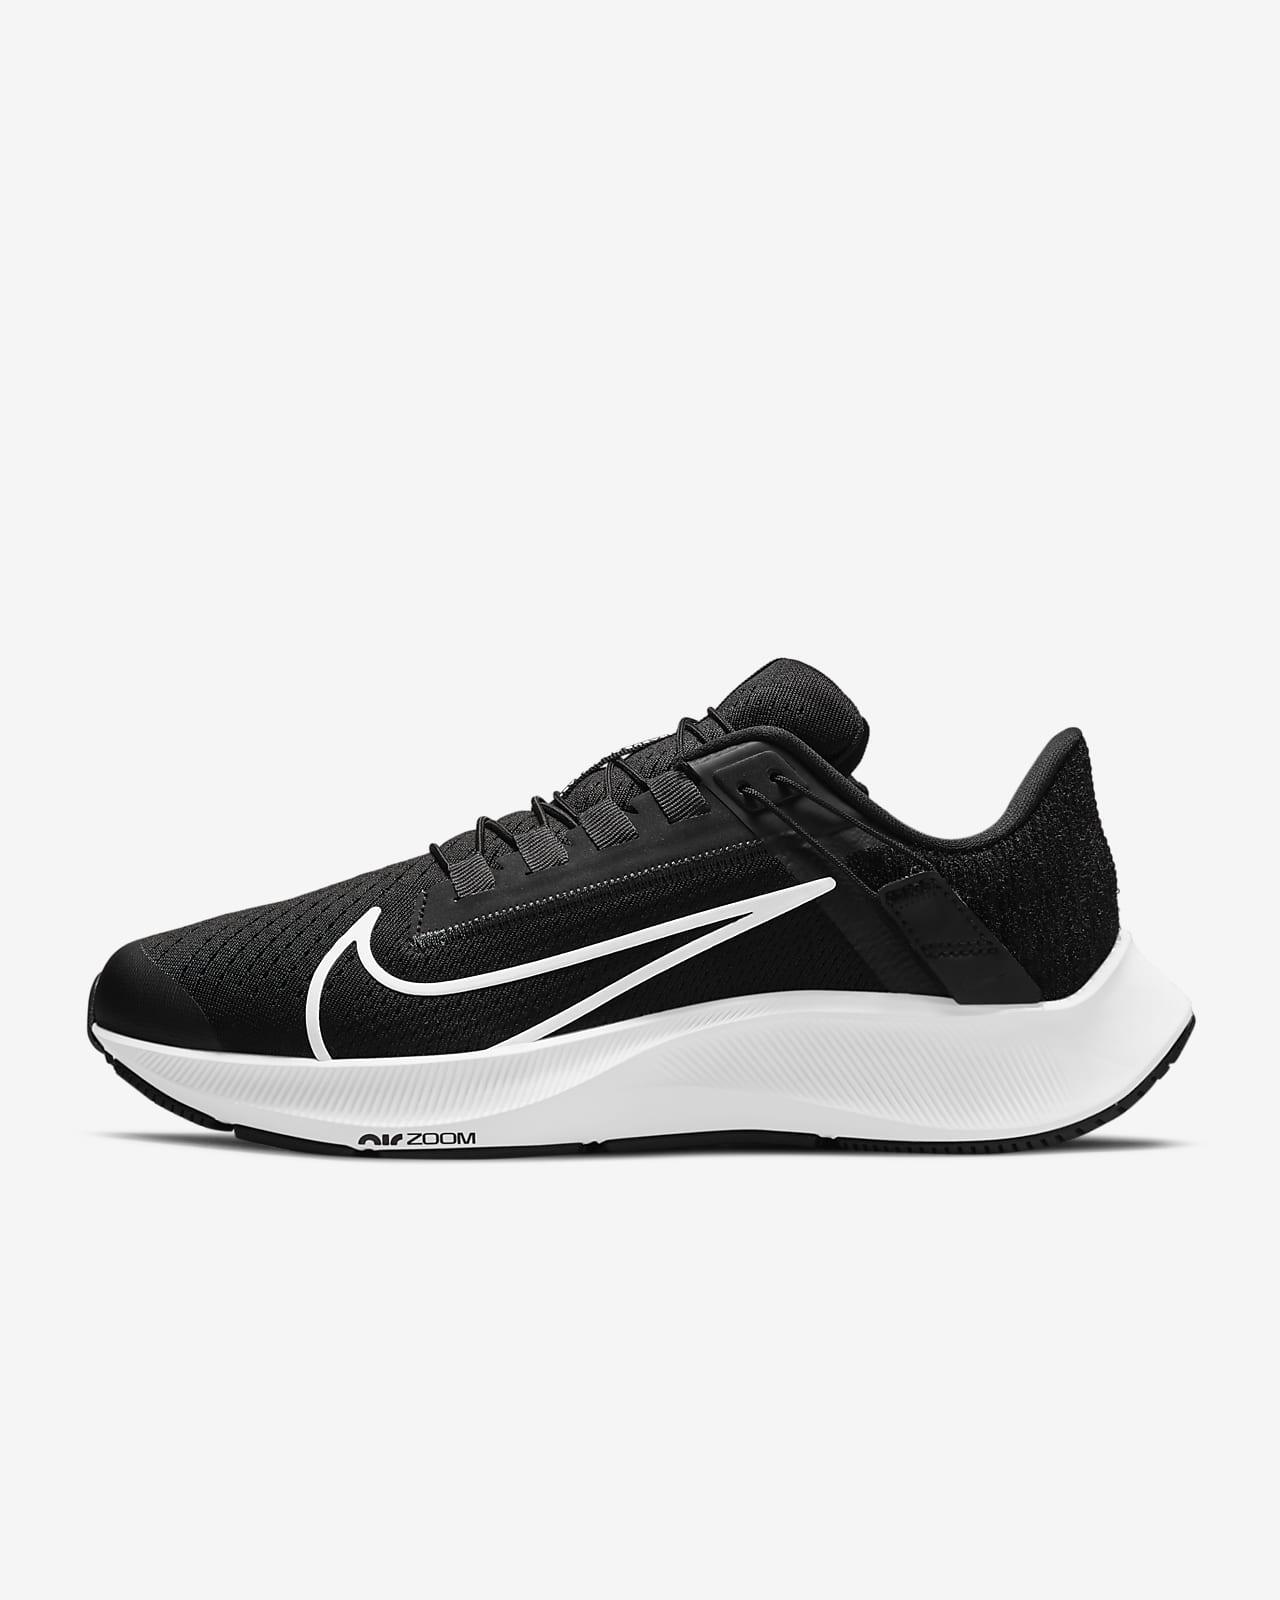 Nike Air Zoom Pegasus 38 FlyEase Women's Running Shoes (Wide)